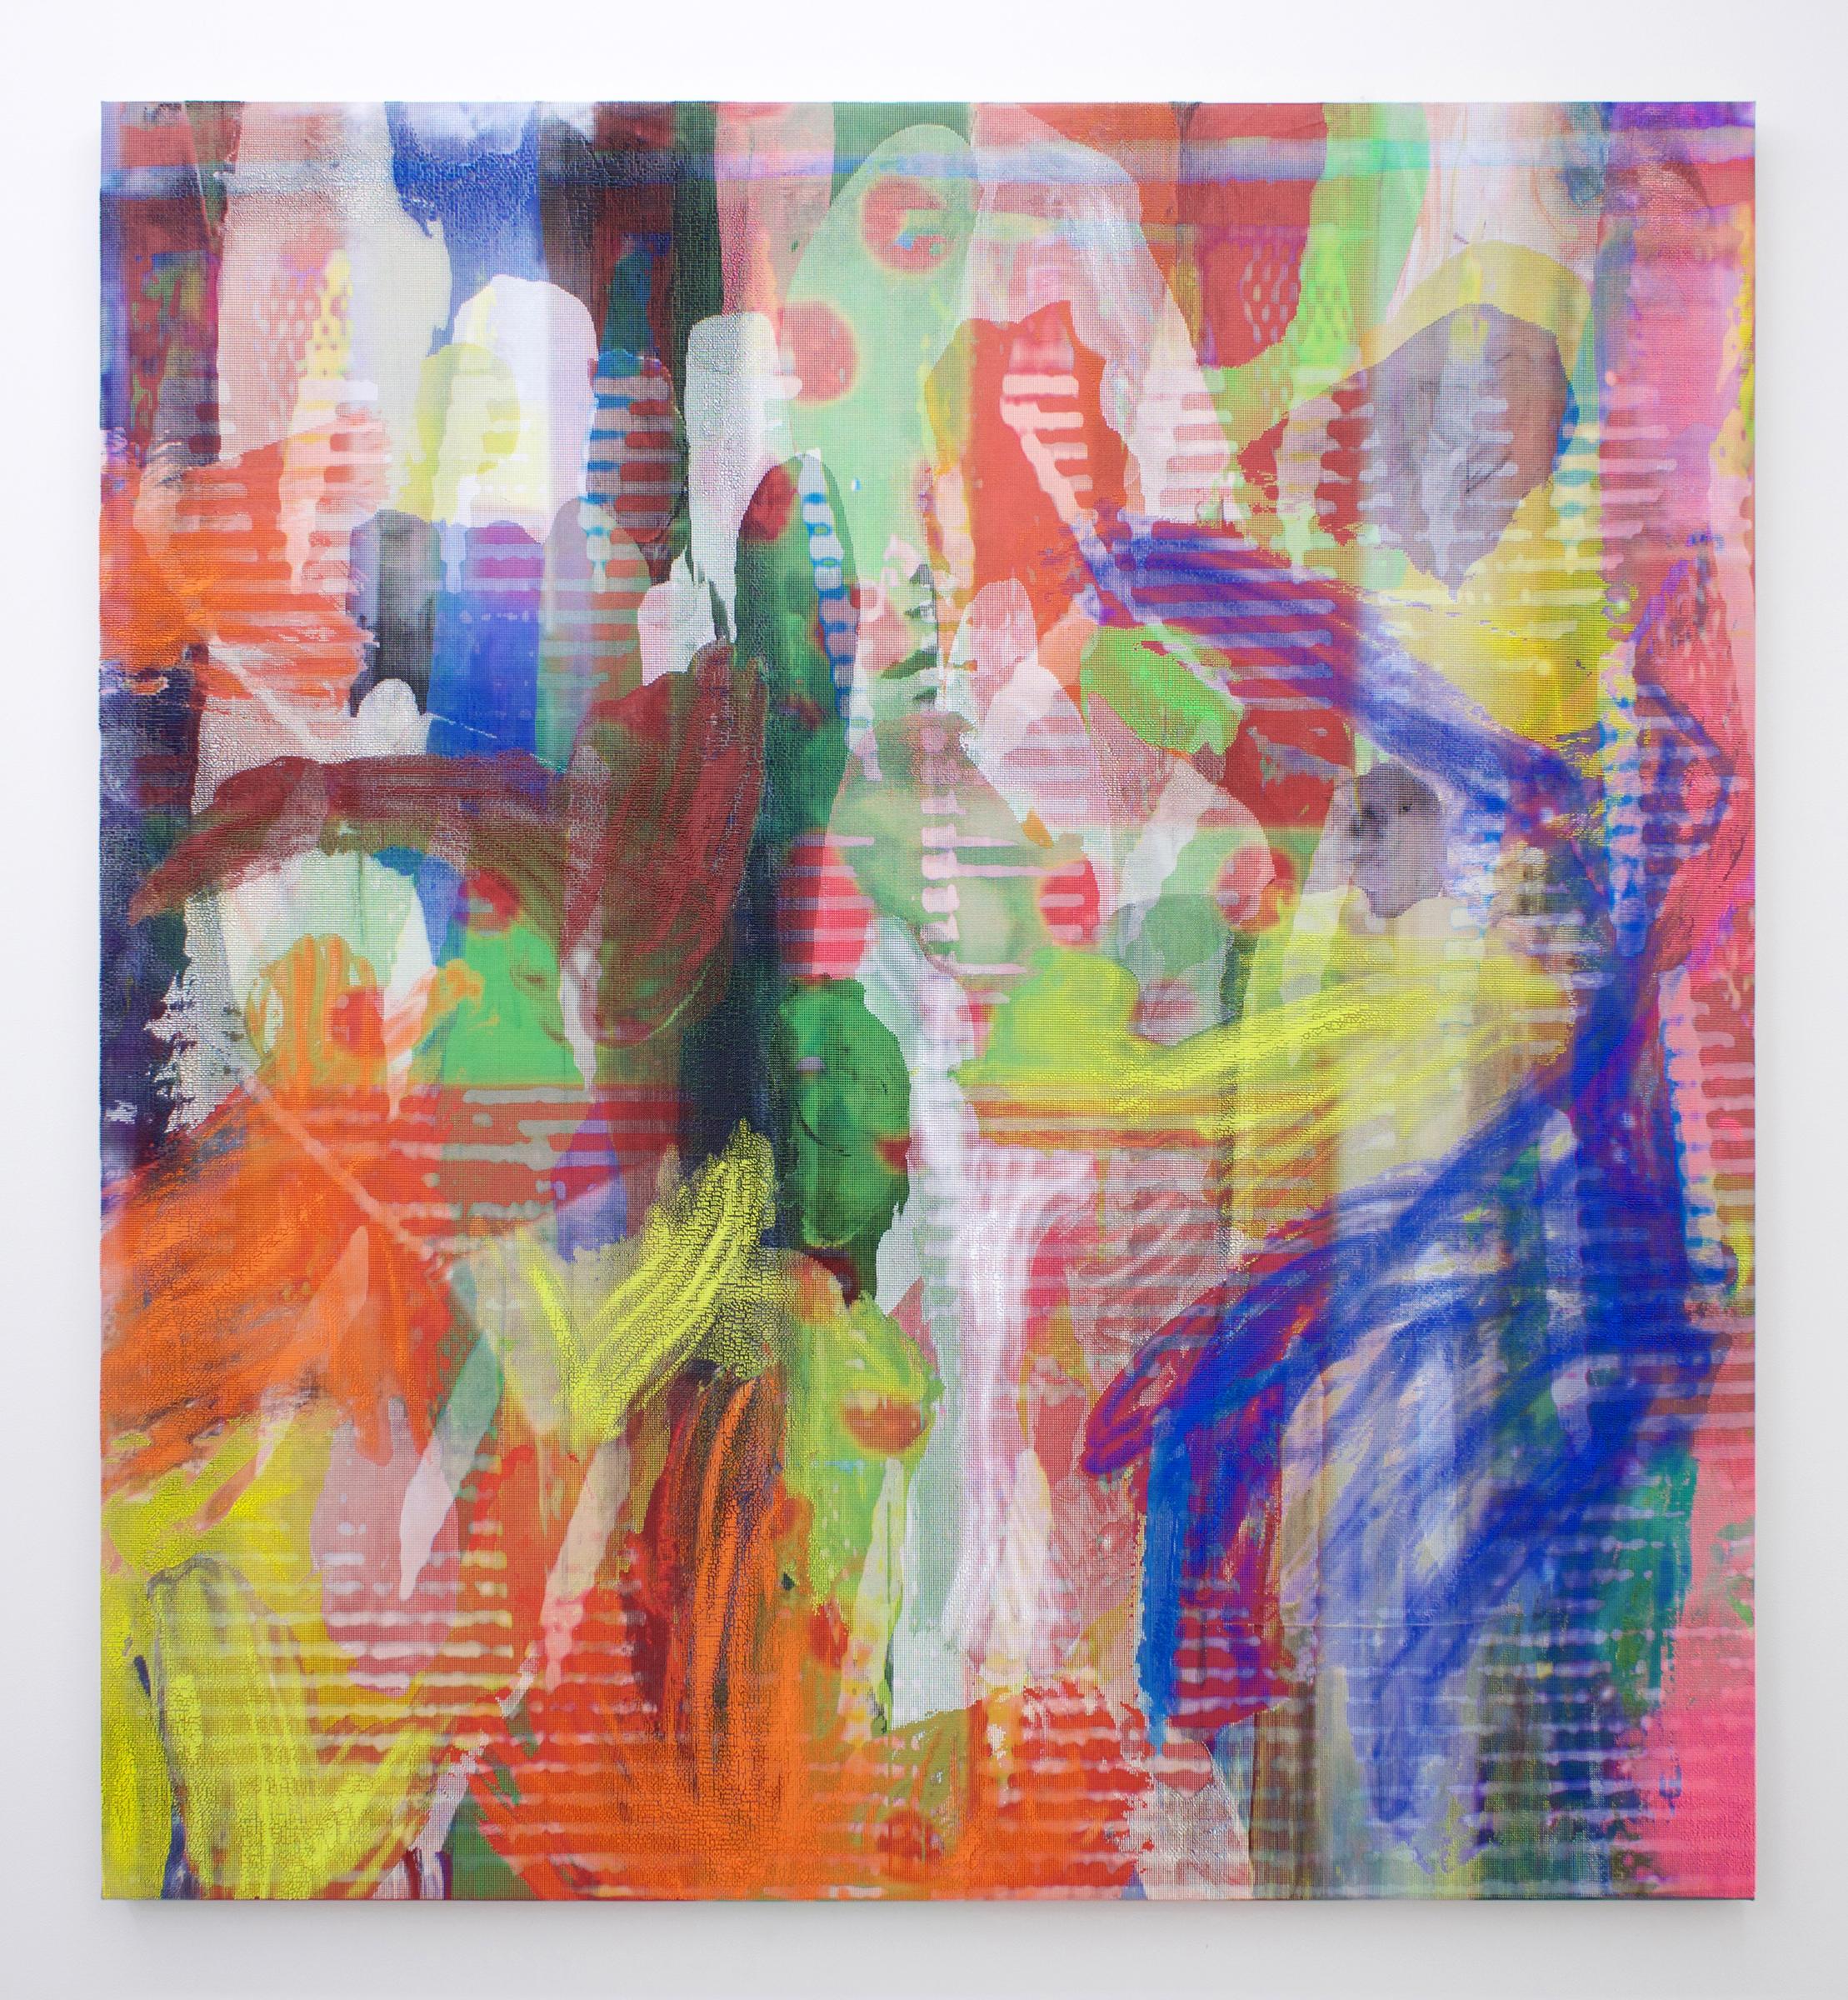 "EVAN NESBIT  Manifold Painting (Ever Dissonant Futures) , 2017, acrylic, UV curable ink on vinyl coated mesh fabric, 66"" x 60"""